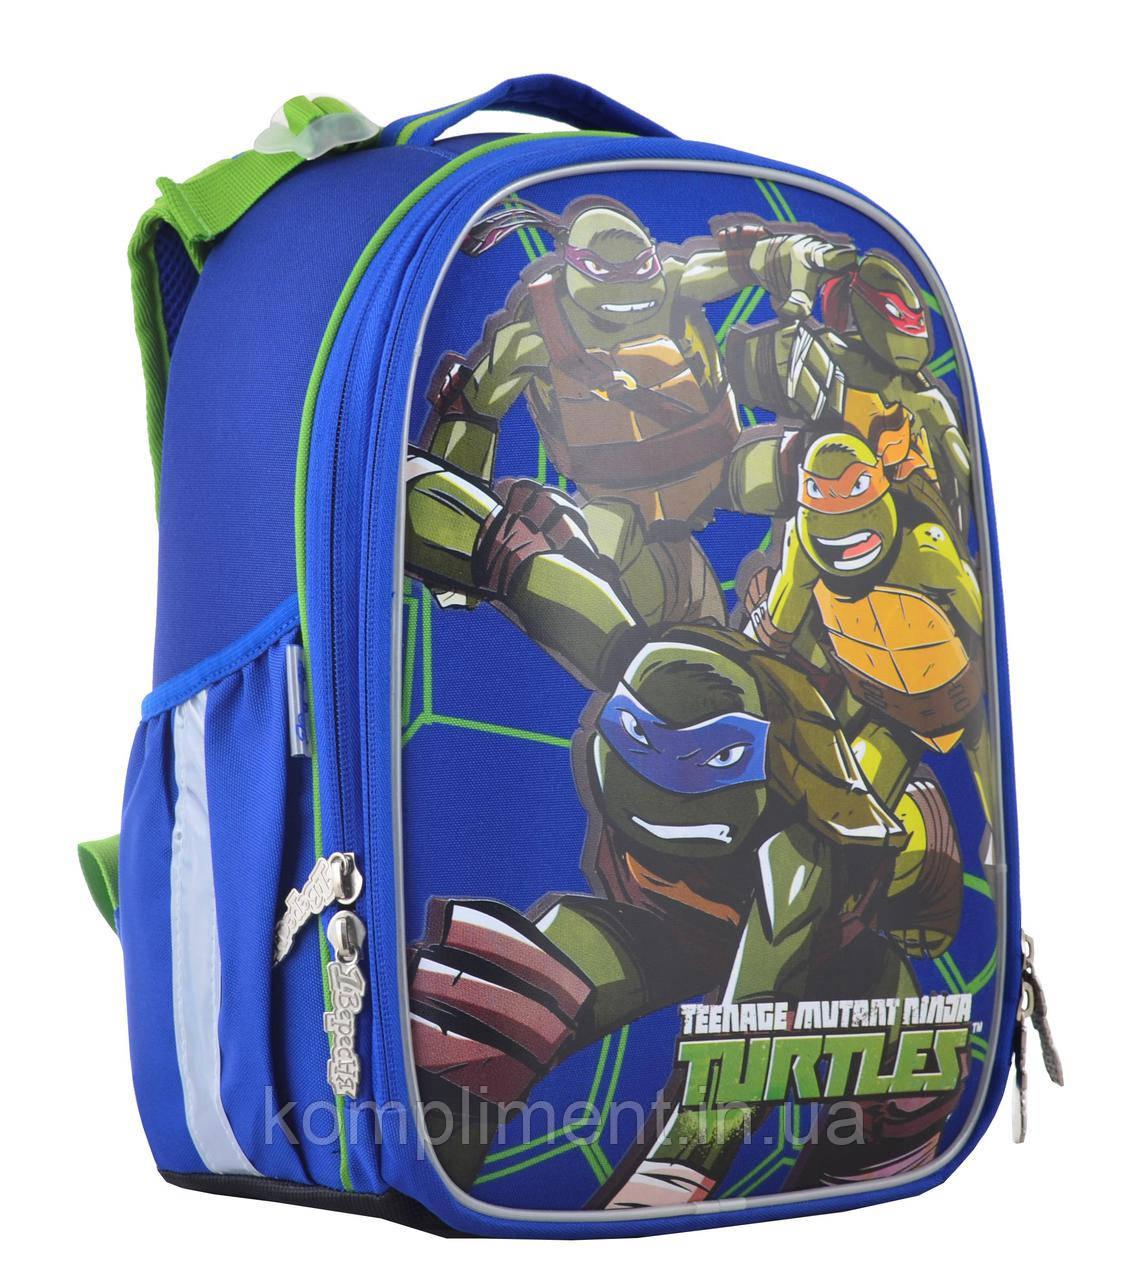 8cae0cb83a0c Ранец каркасный ортопедический H-25 Ninja Turtles, 33.5*25*13.5, 1 ...